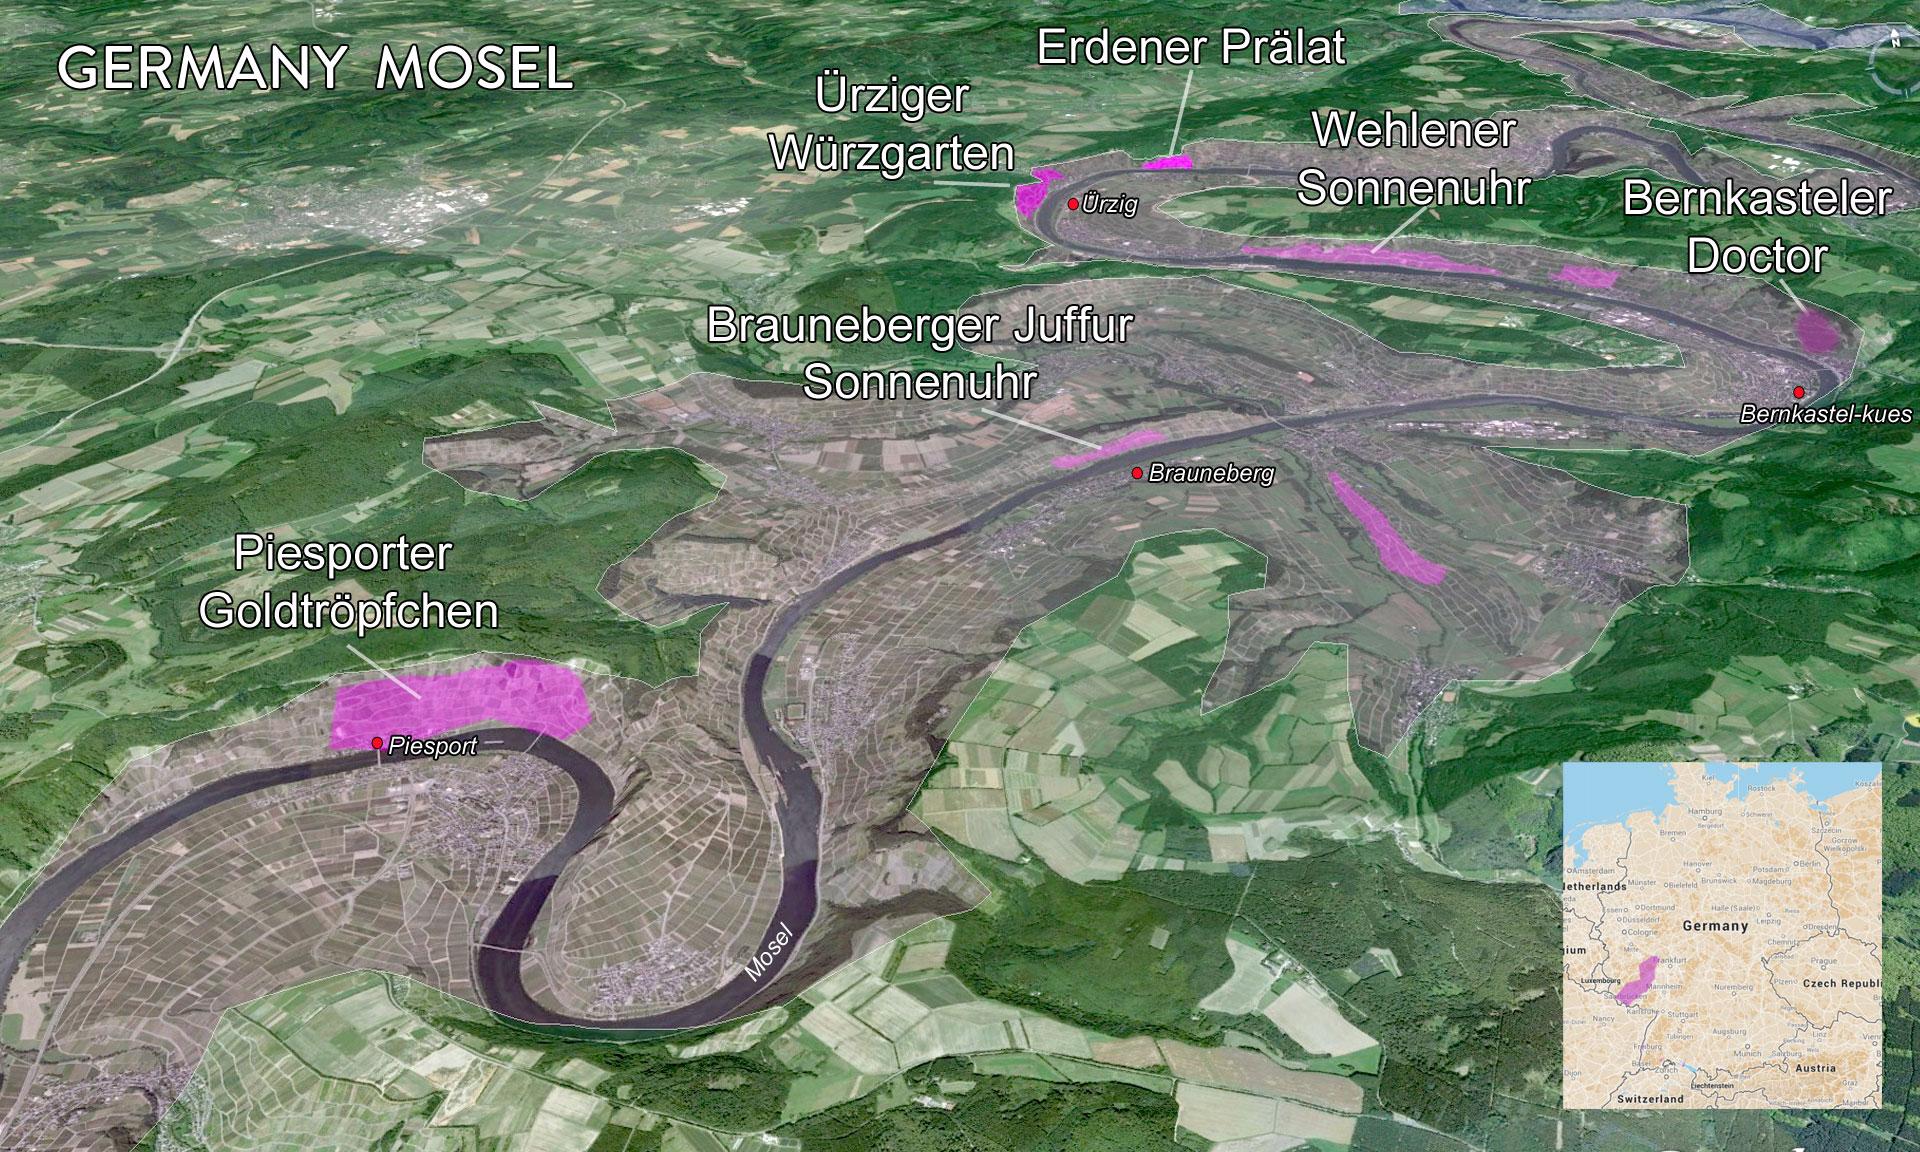 Germany-Mosel.jpg